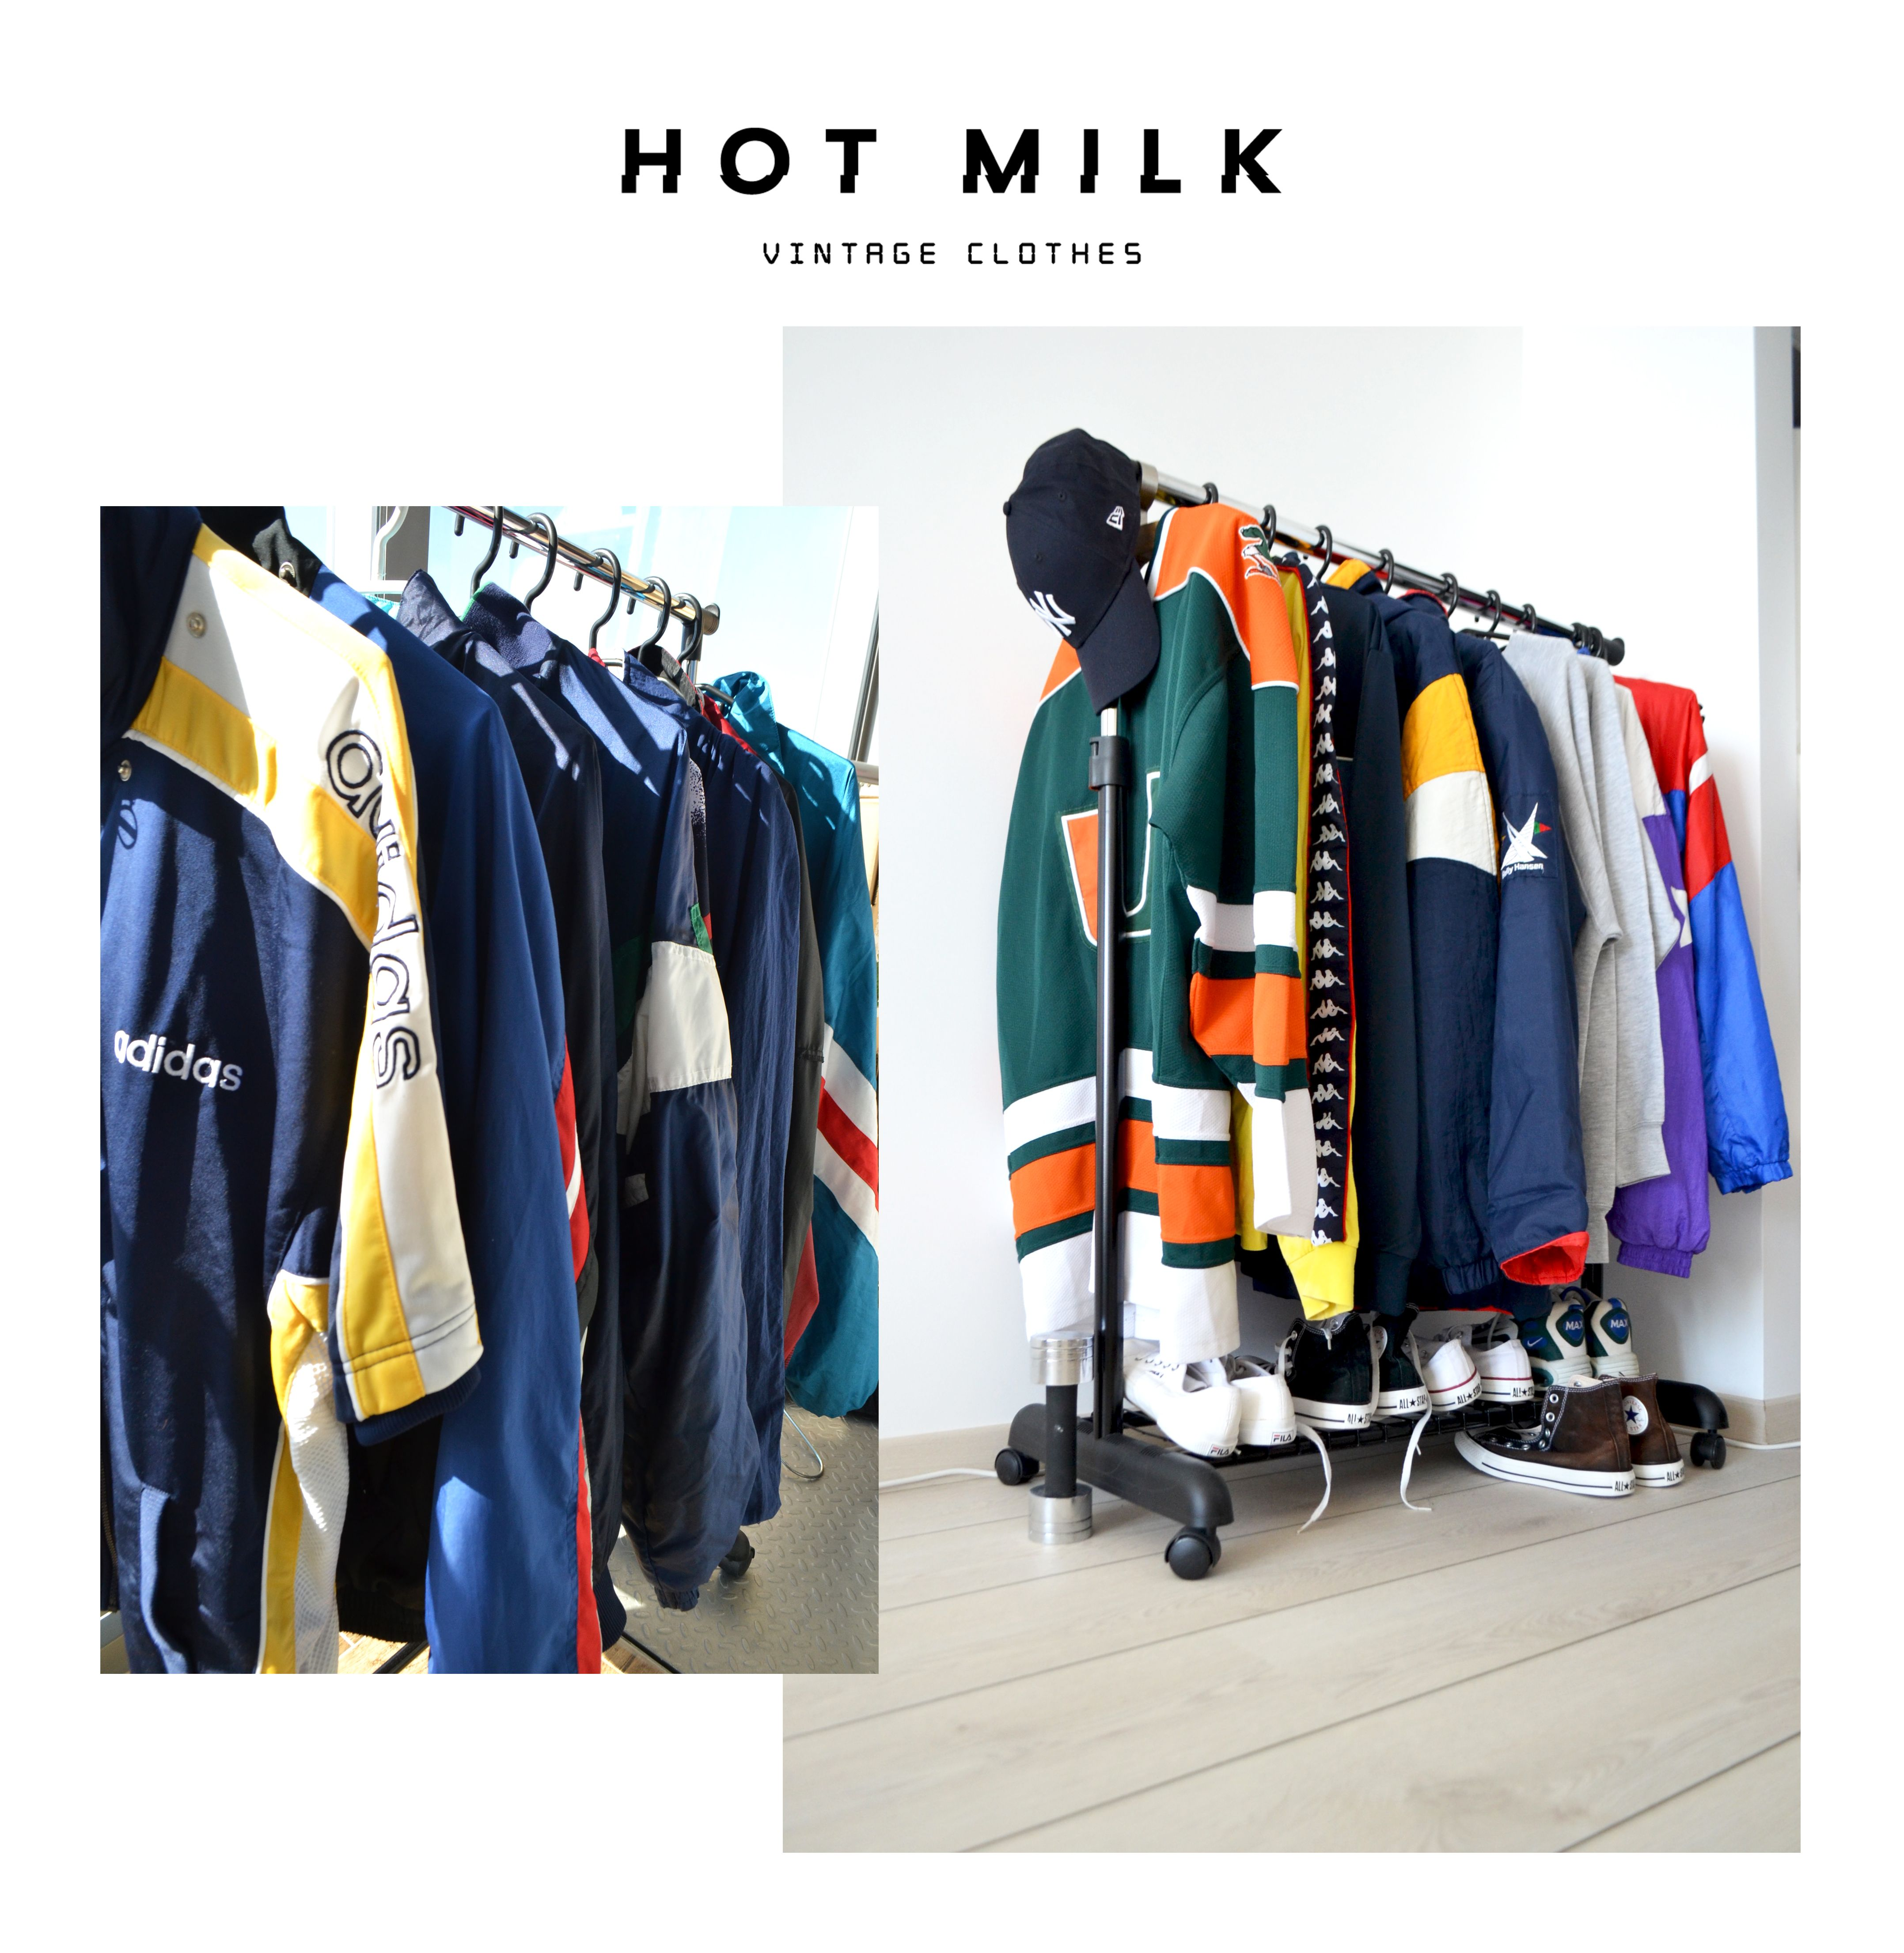 Vintage 90s Streetwear Clothing Vintage Clothes Shop Vintage Outfits Vintage Clothing Online